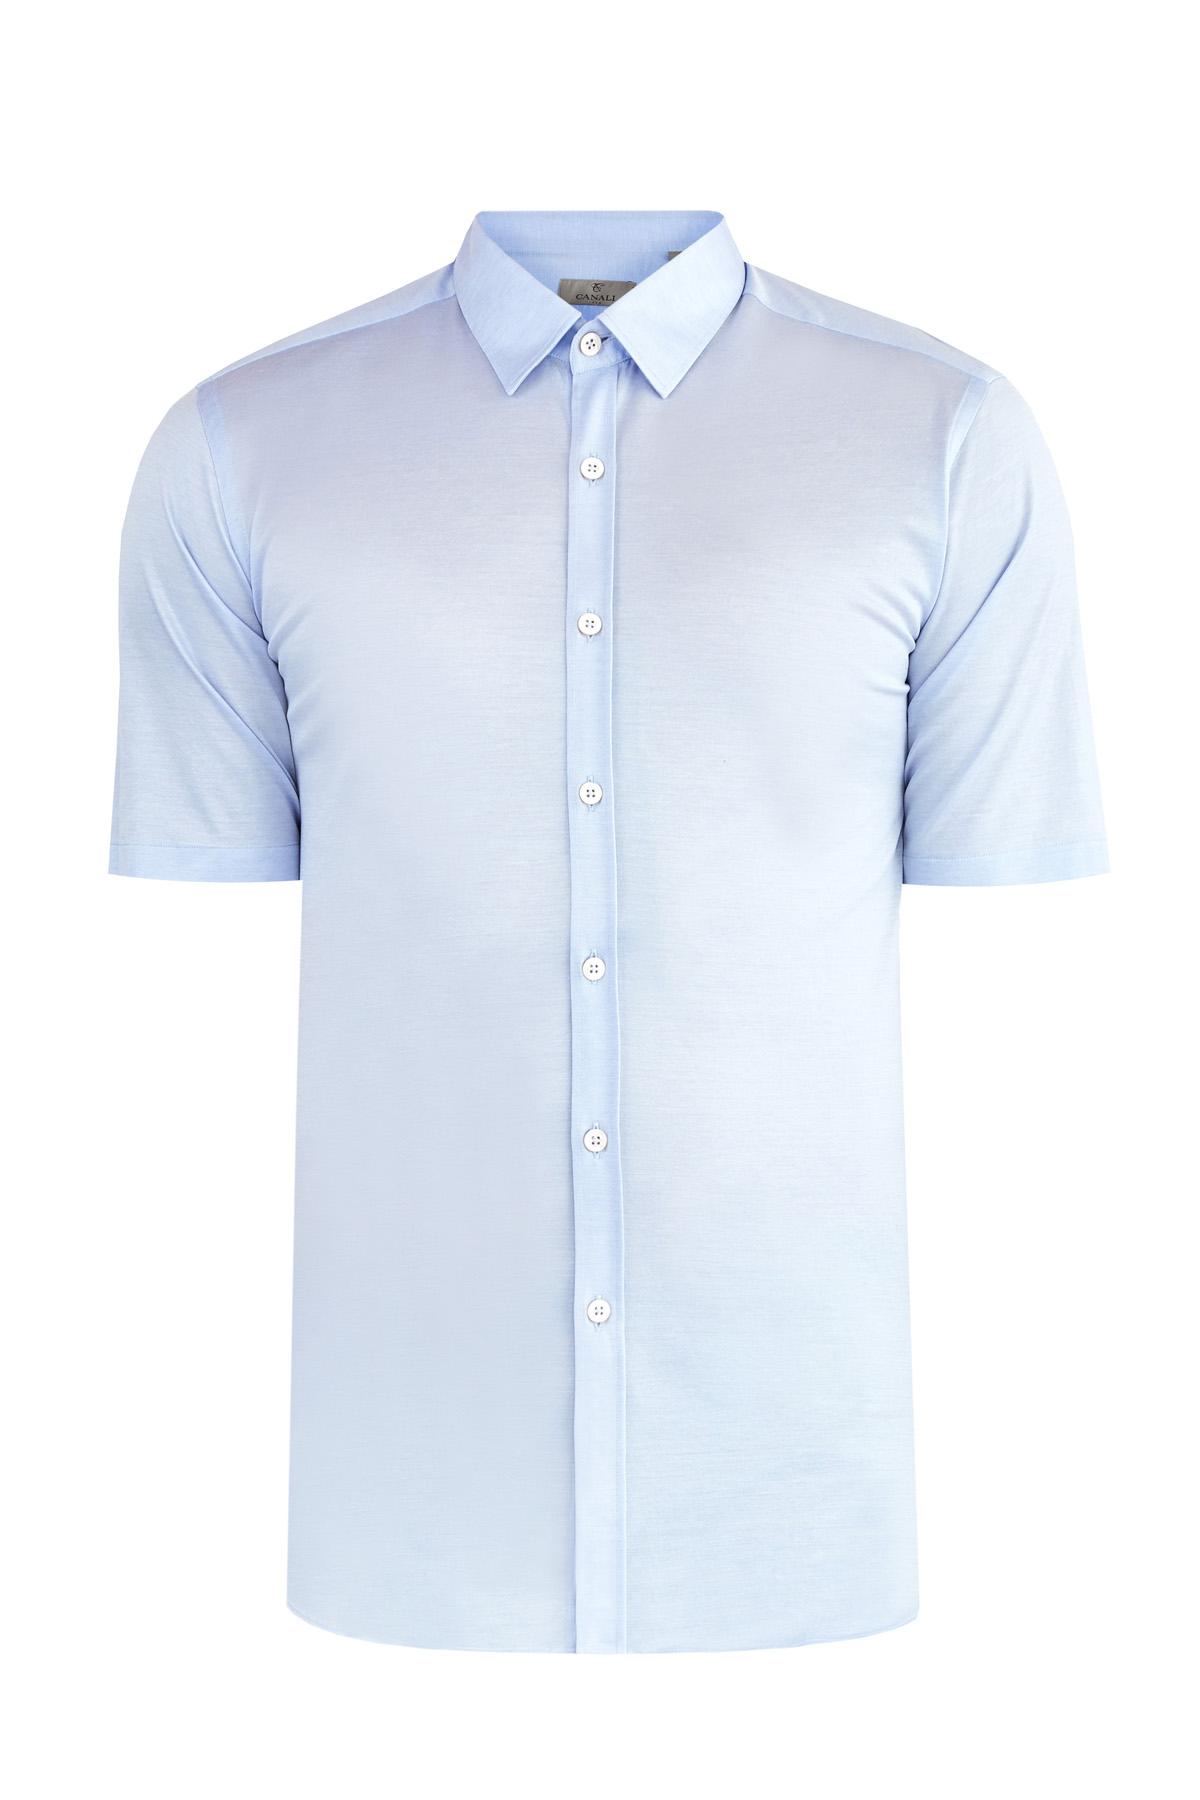 Базовая голубая рубашка с коротким рукавом из пике